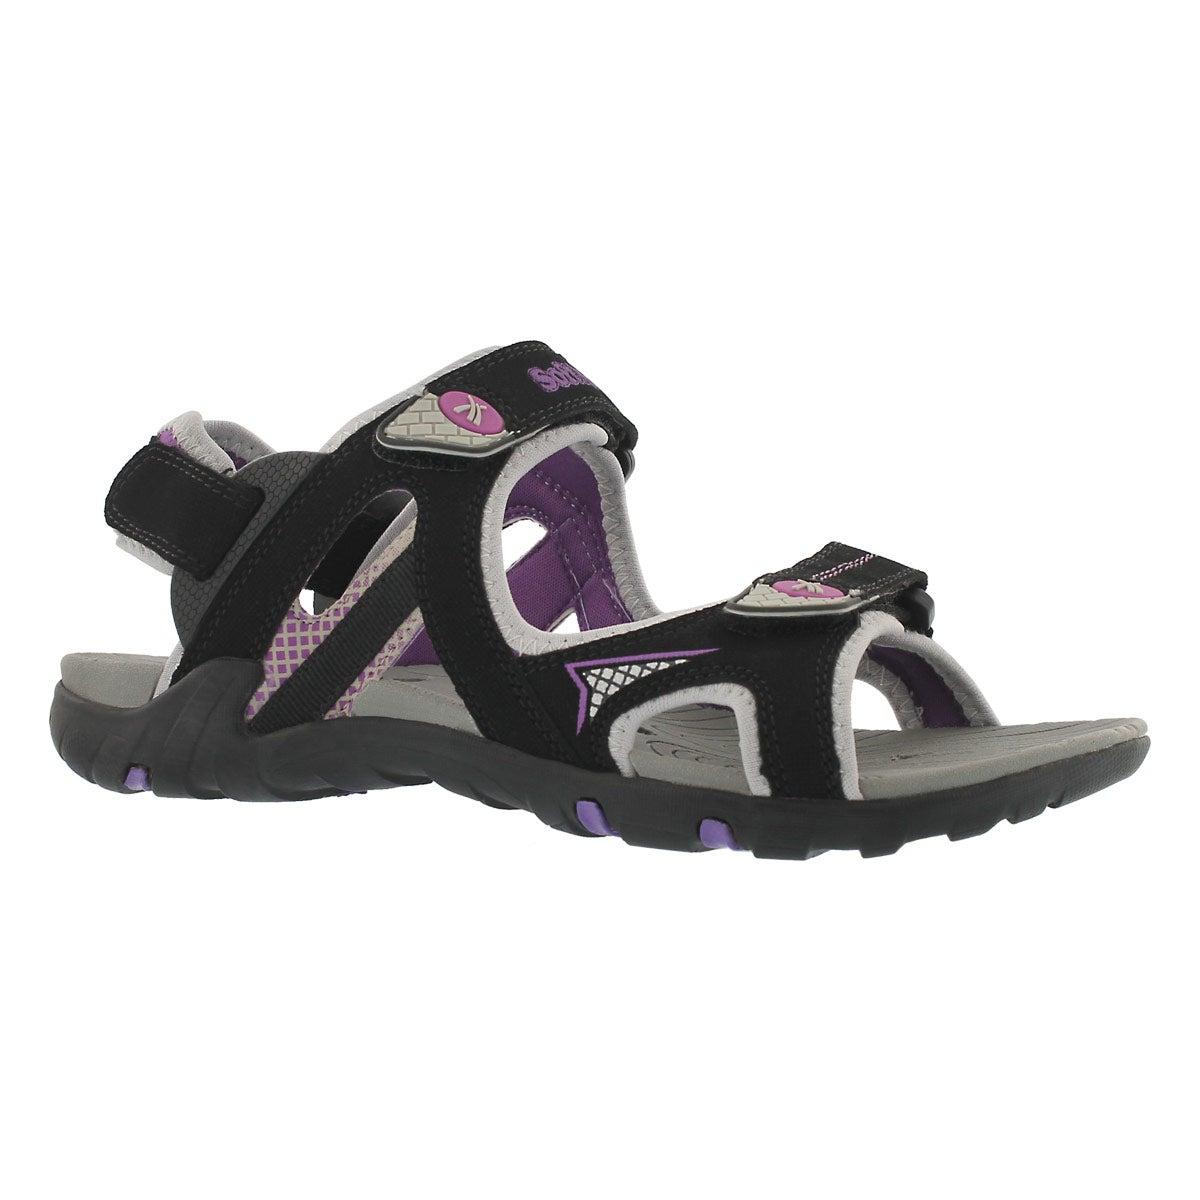 Women's KATELYN black 3 strap sport sandals